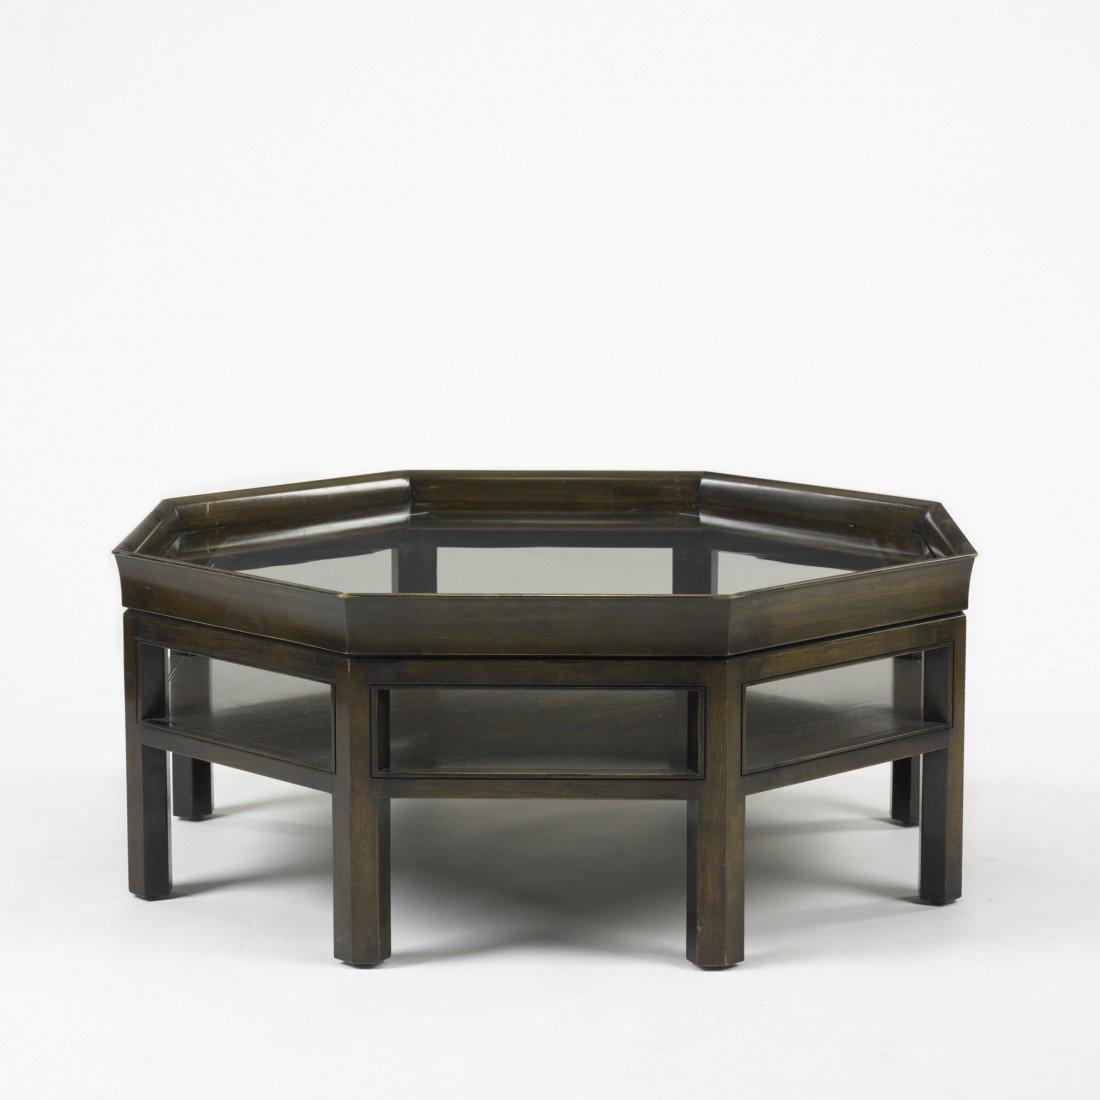 130: Baker coffee table